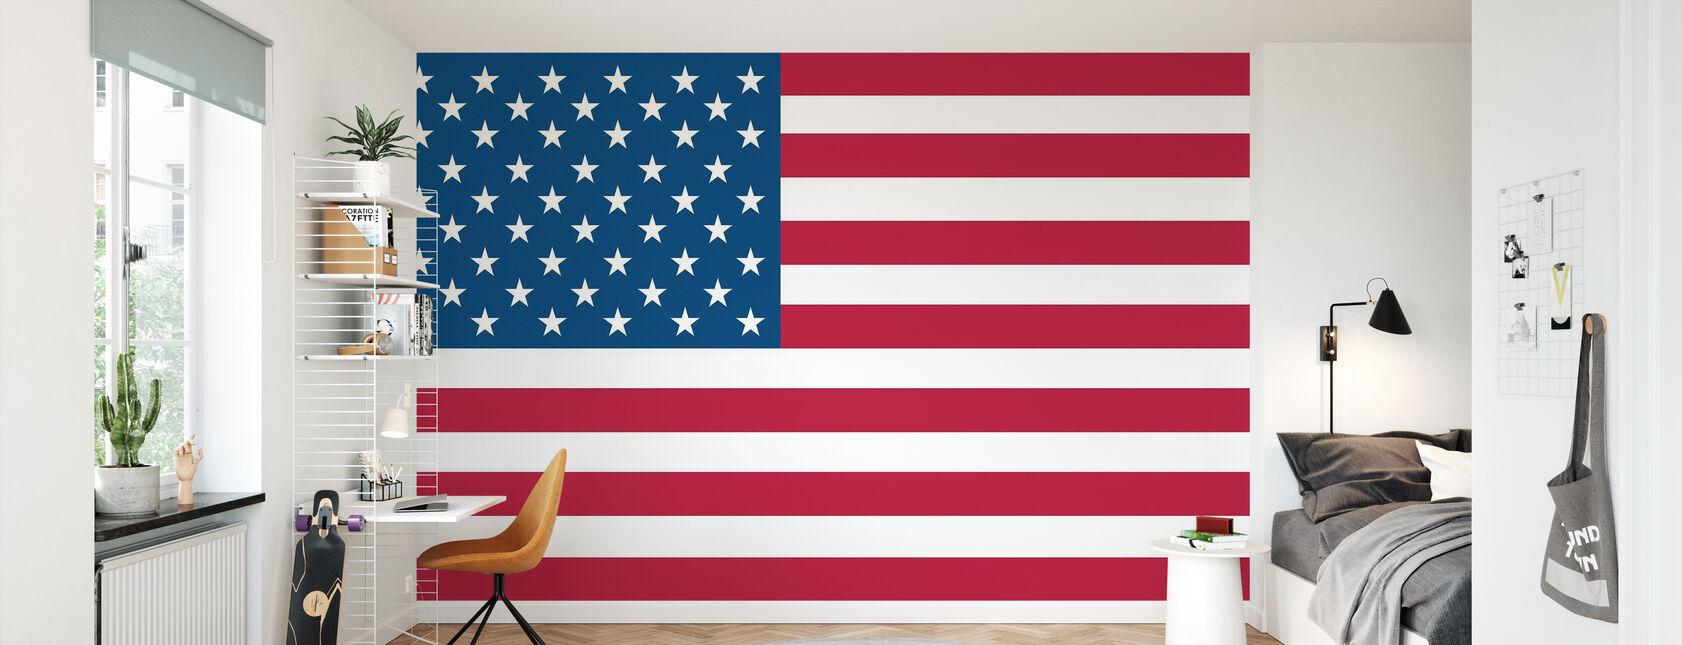 Flag of United States - Wallpaper - Kids Room